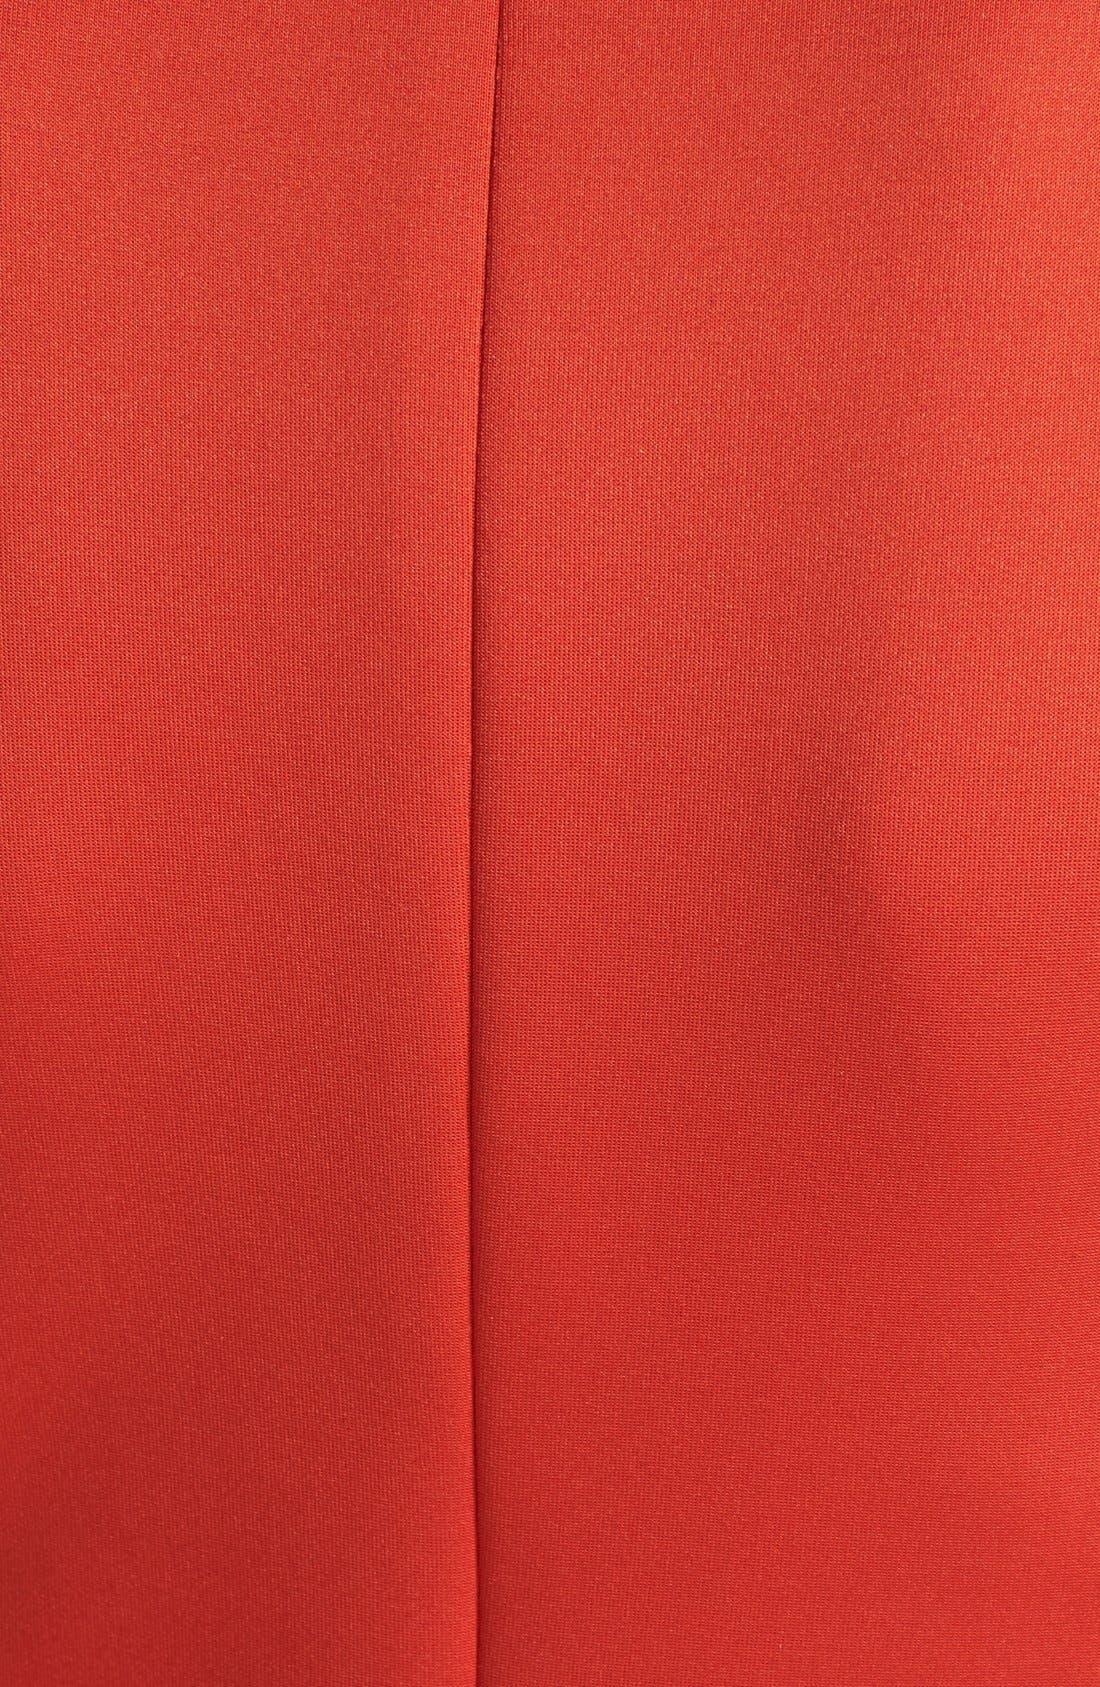 Alternate Image 4  - Ivy & Blu Woven Fit & Flare Dress